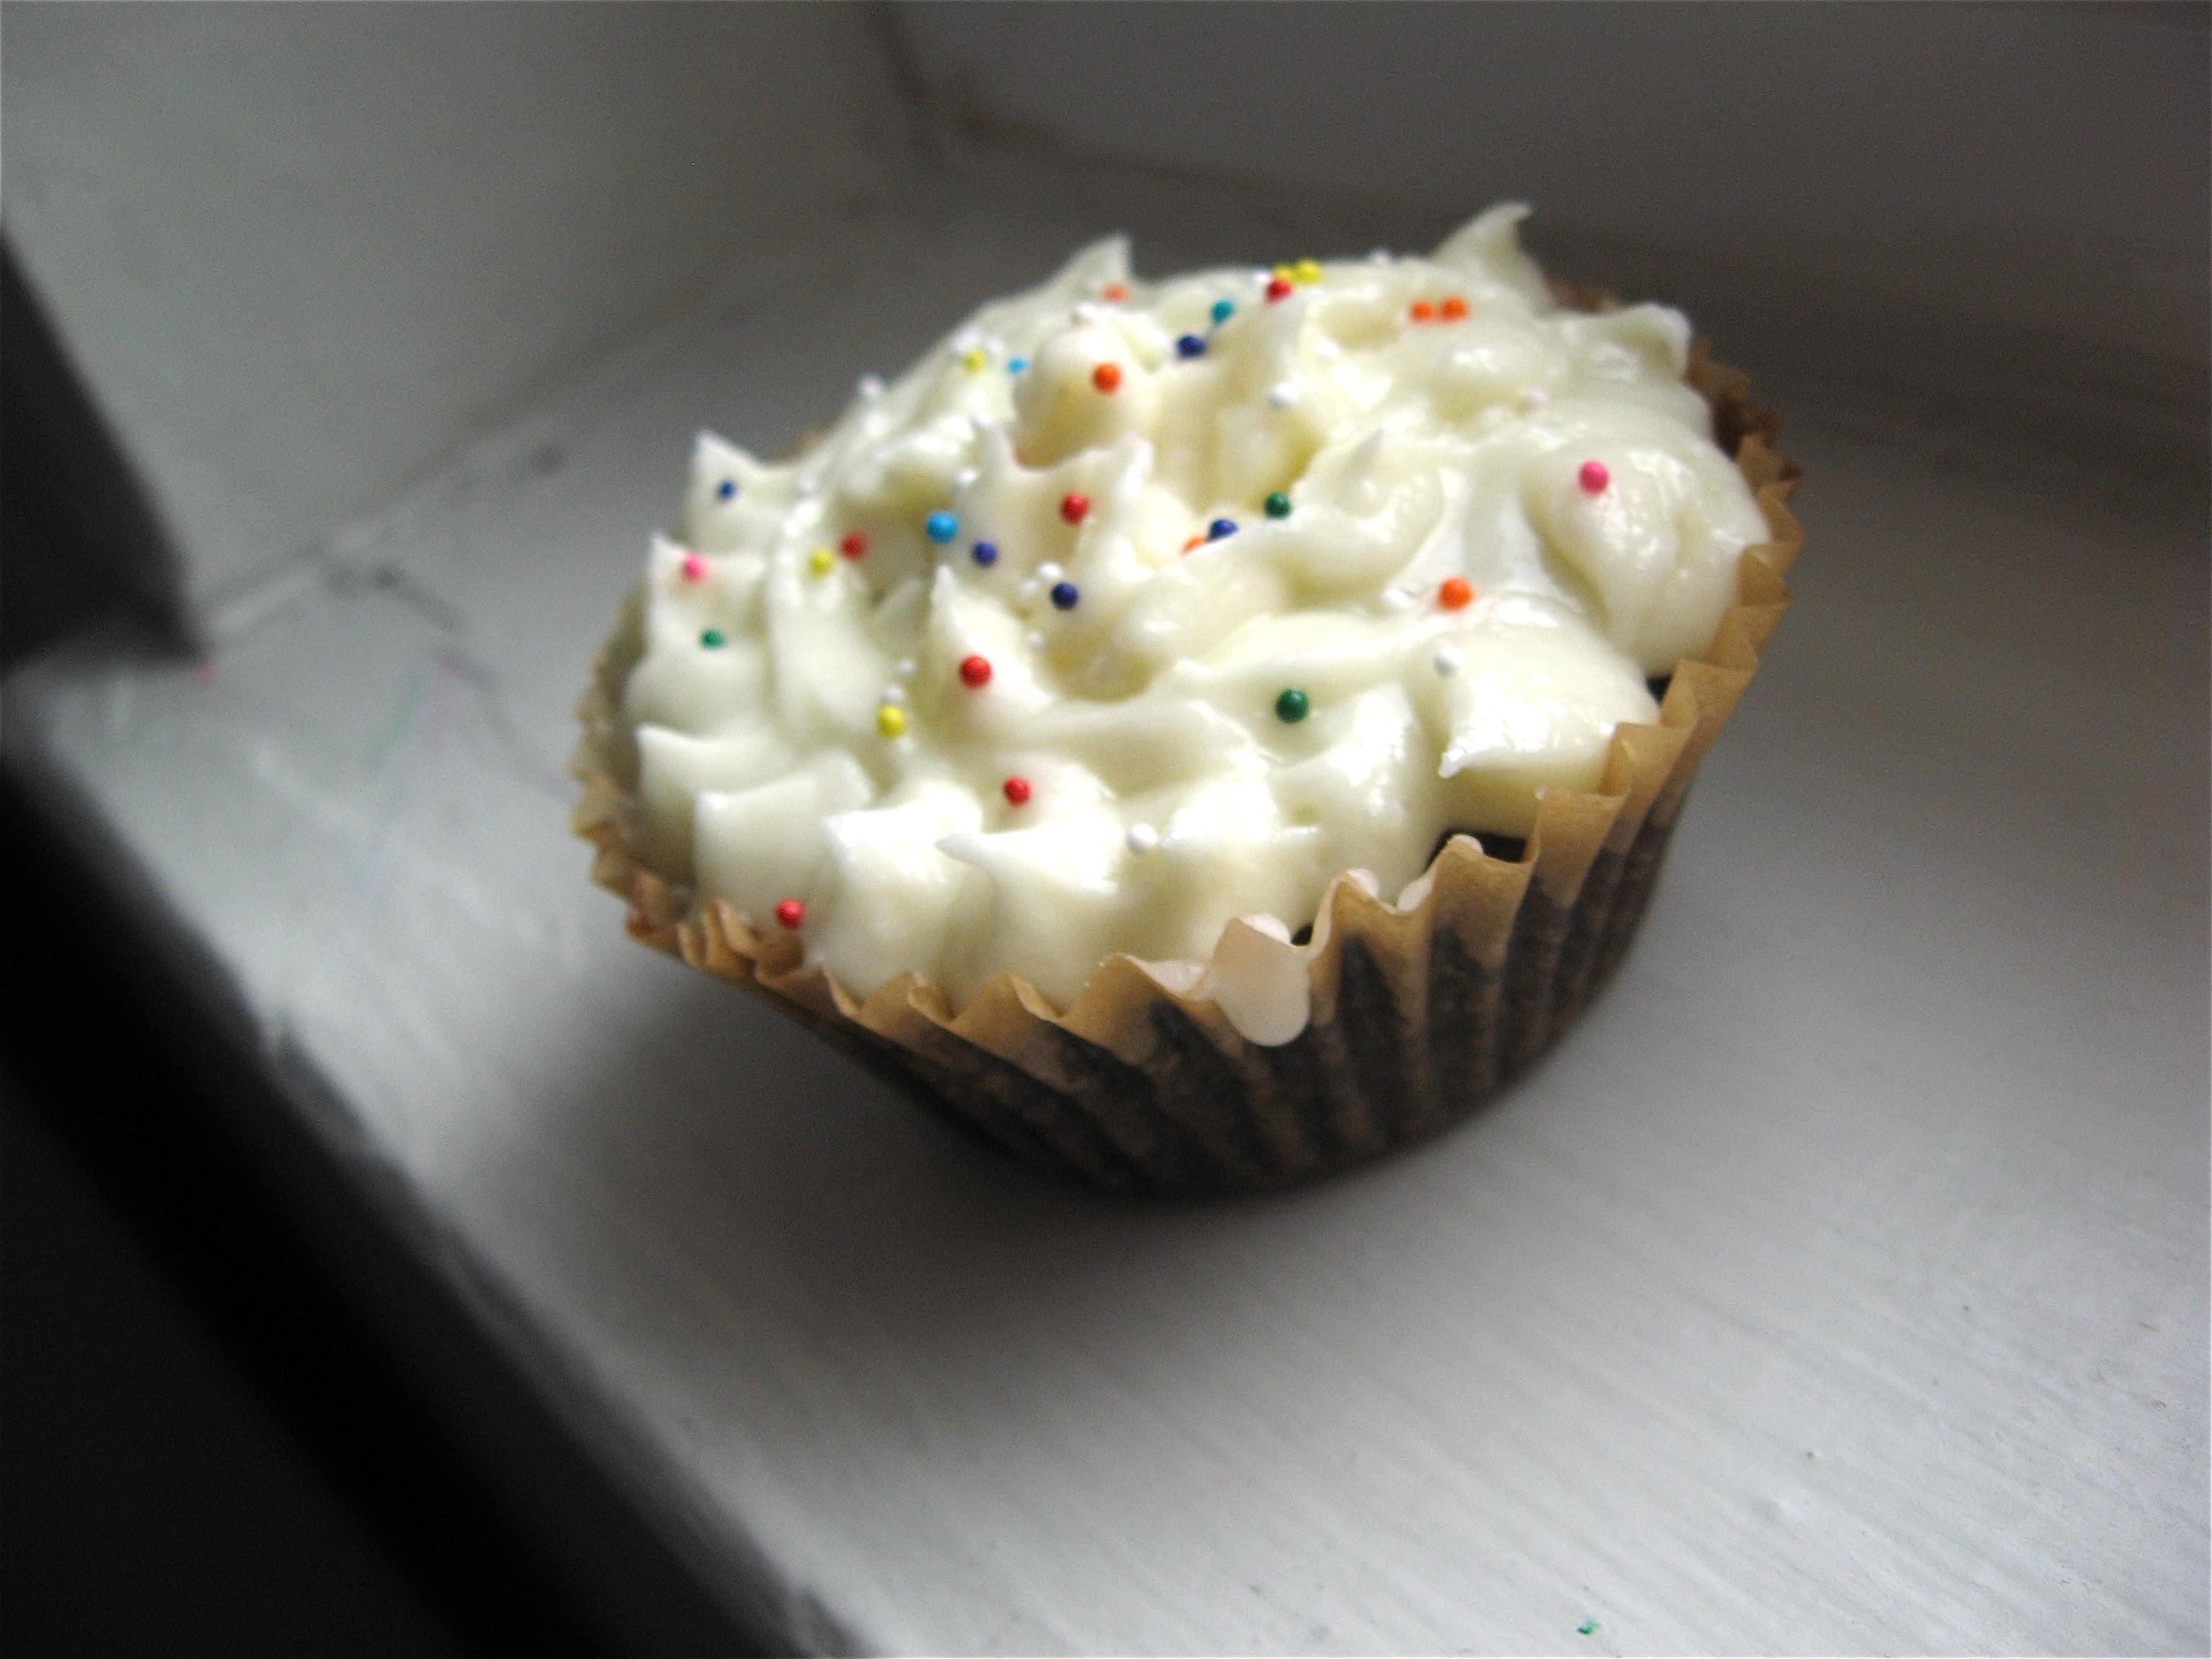 Chocolate Wacky Cake Frosting Recipe